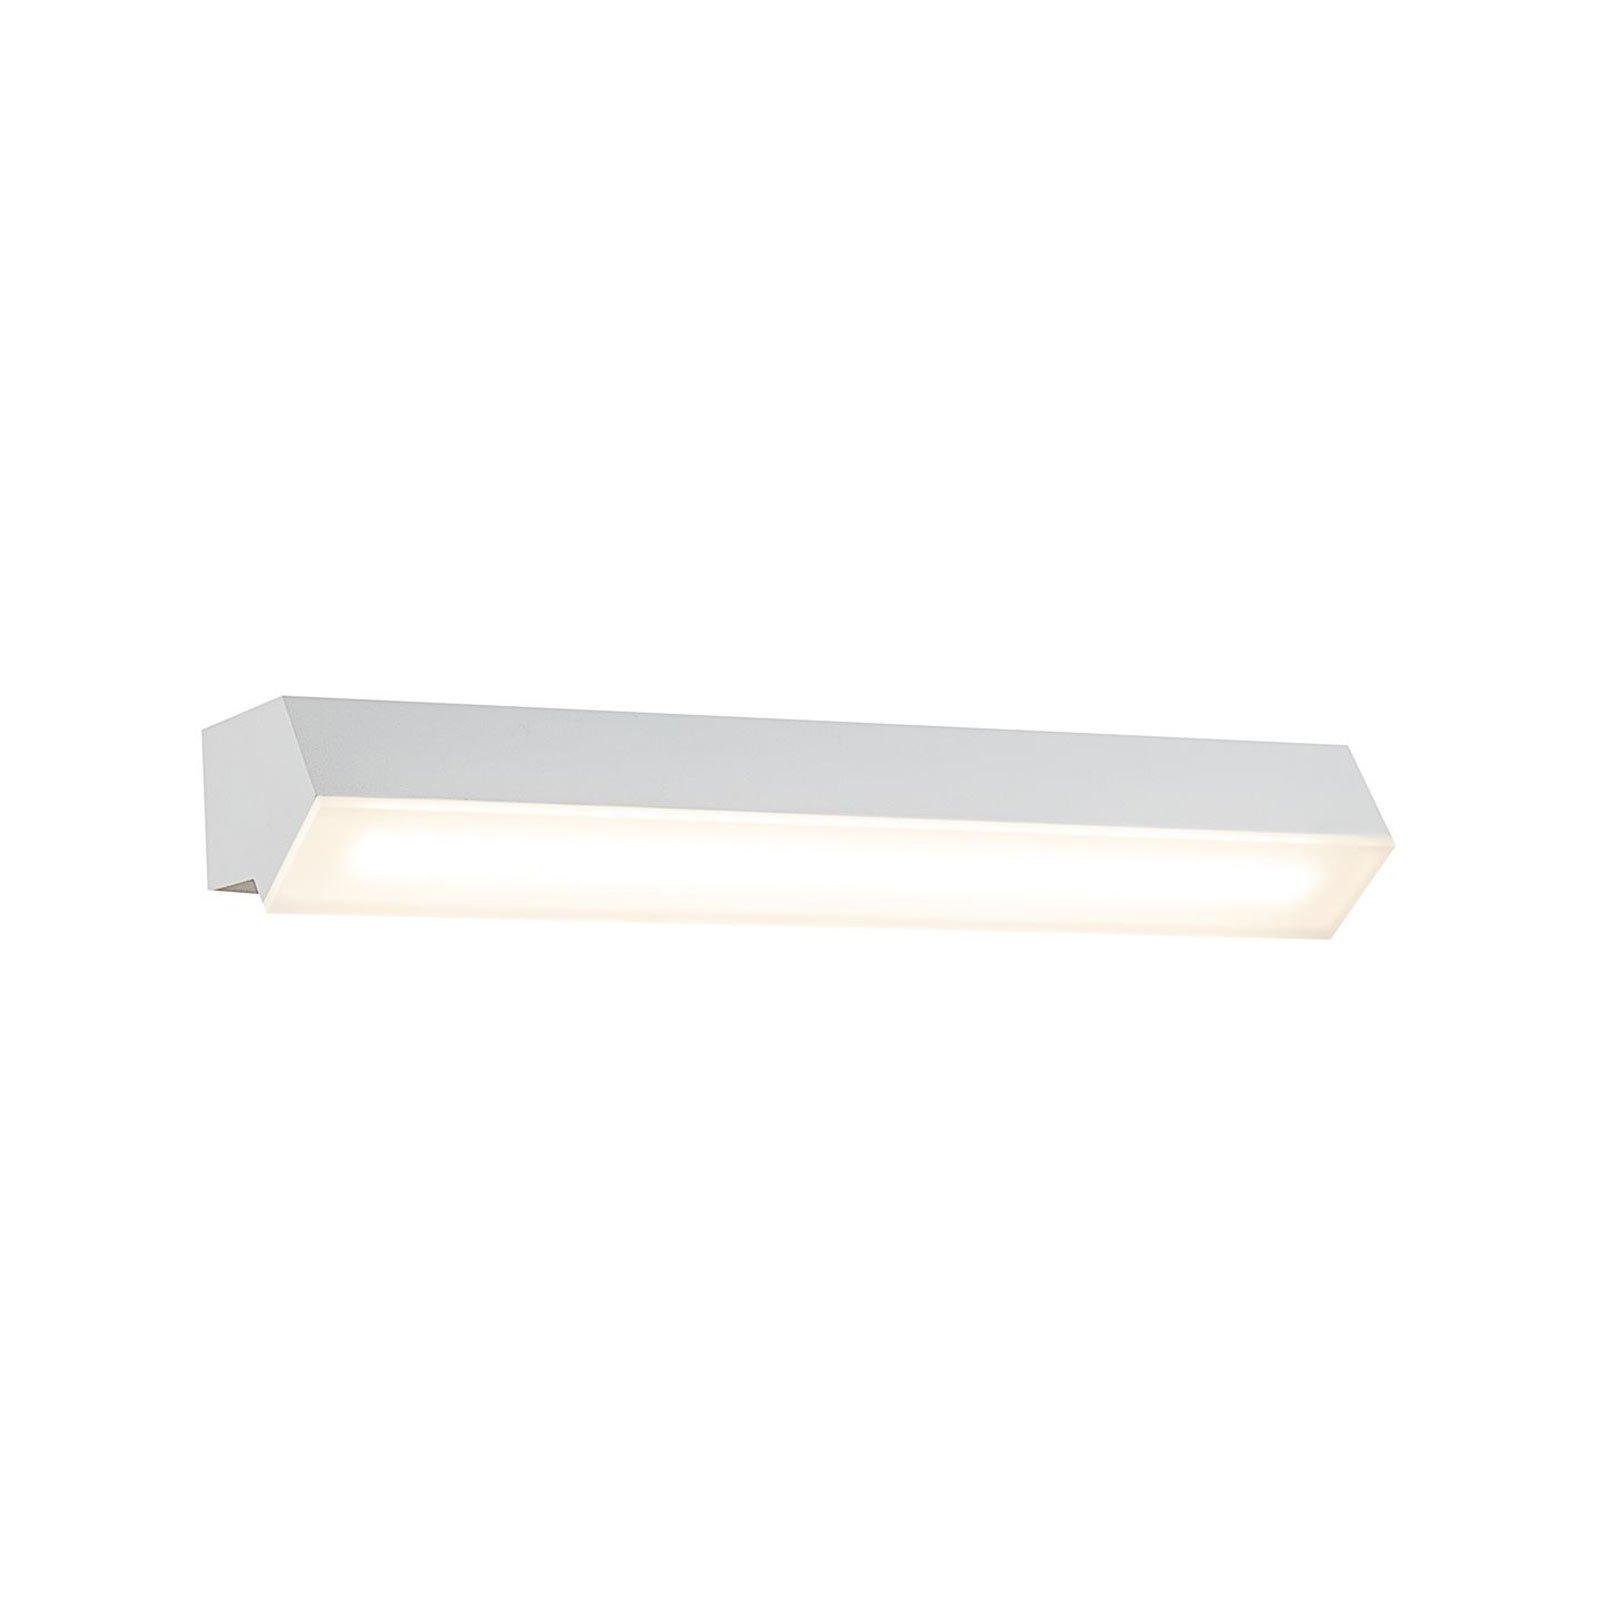 Toni LED-vegglampe, bredde 37 cm